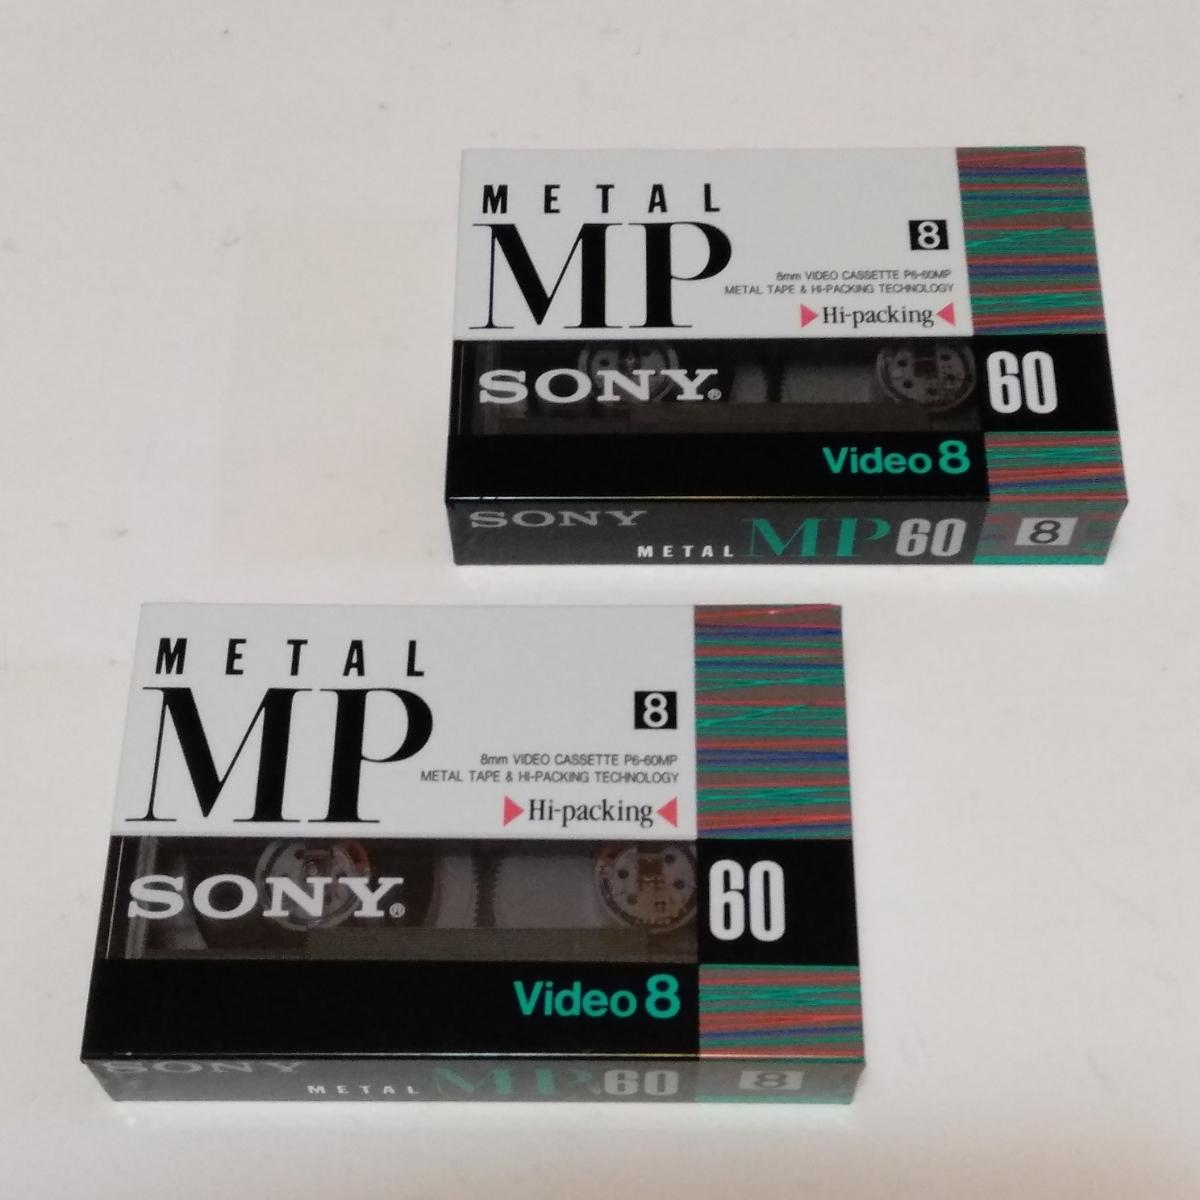 8 millimeter videotape METAL MP 60 SONY Video8 P6-60MP 2 pcs set